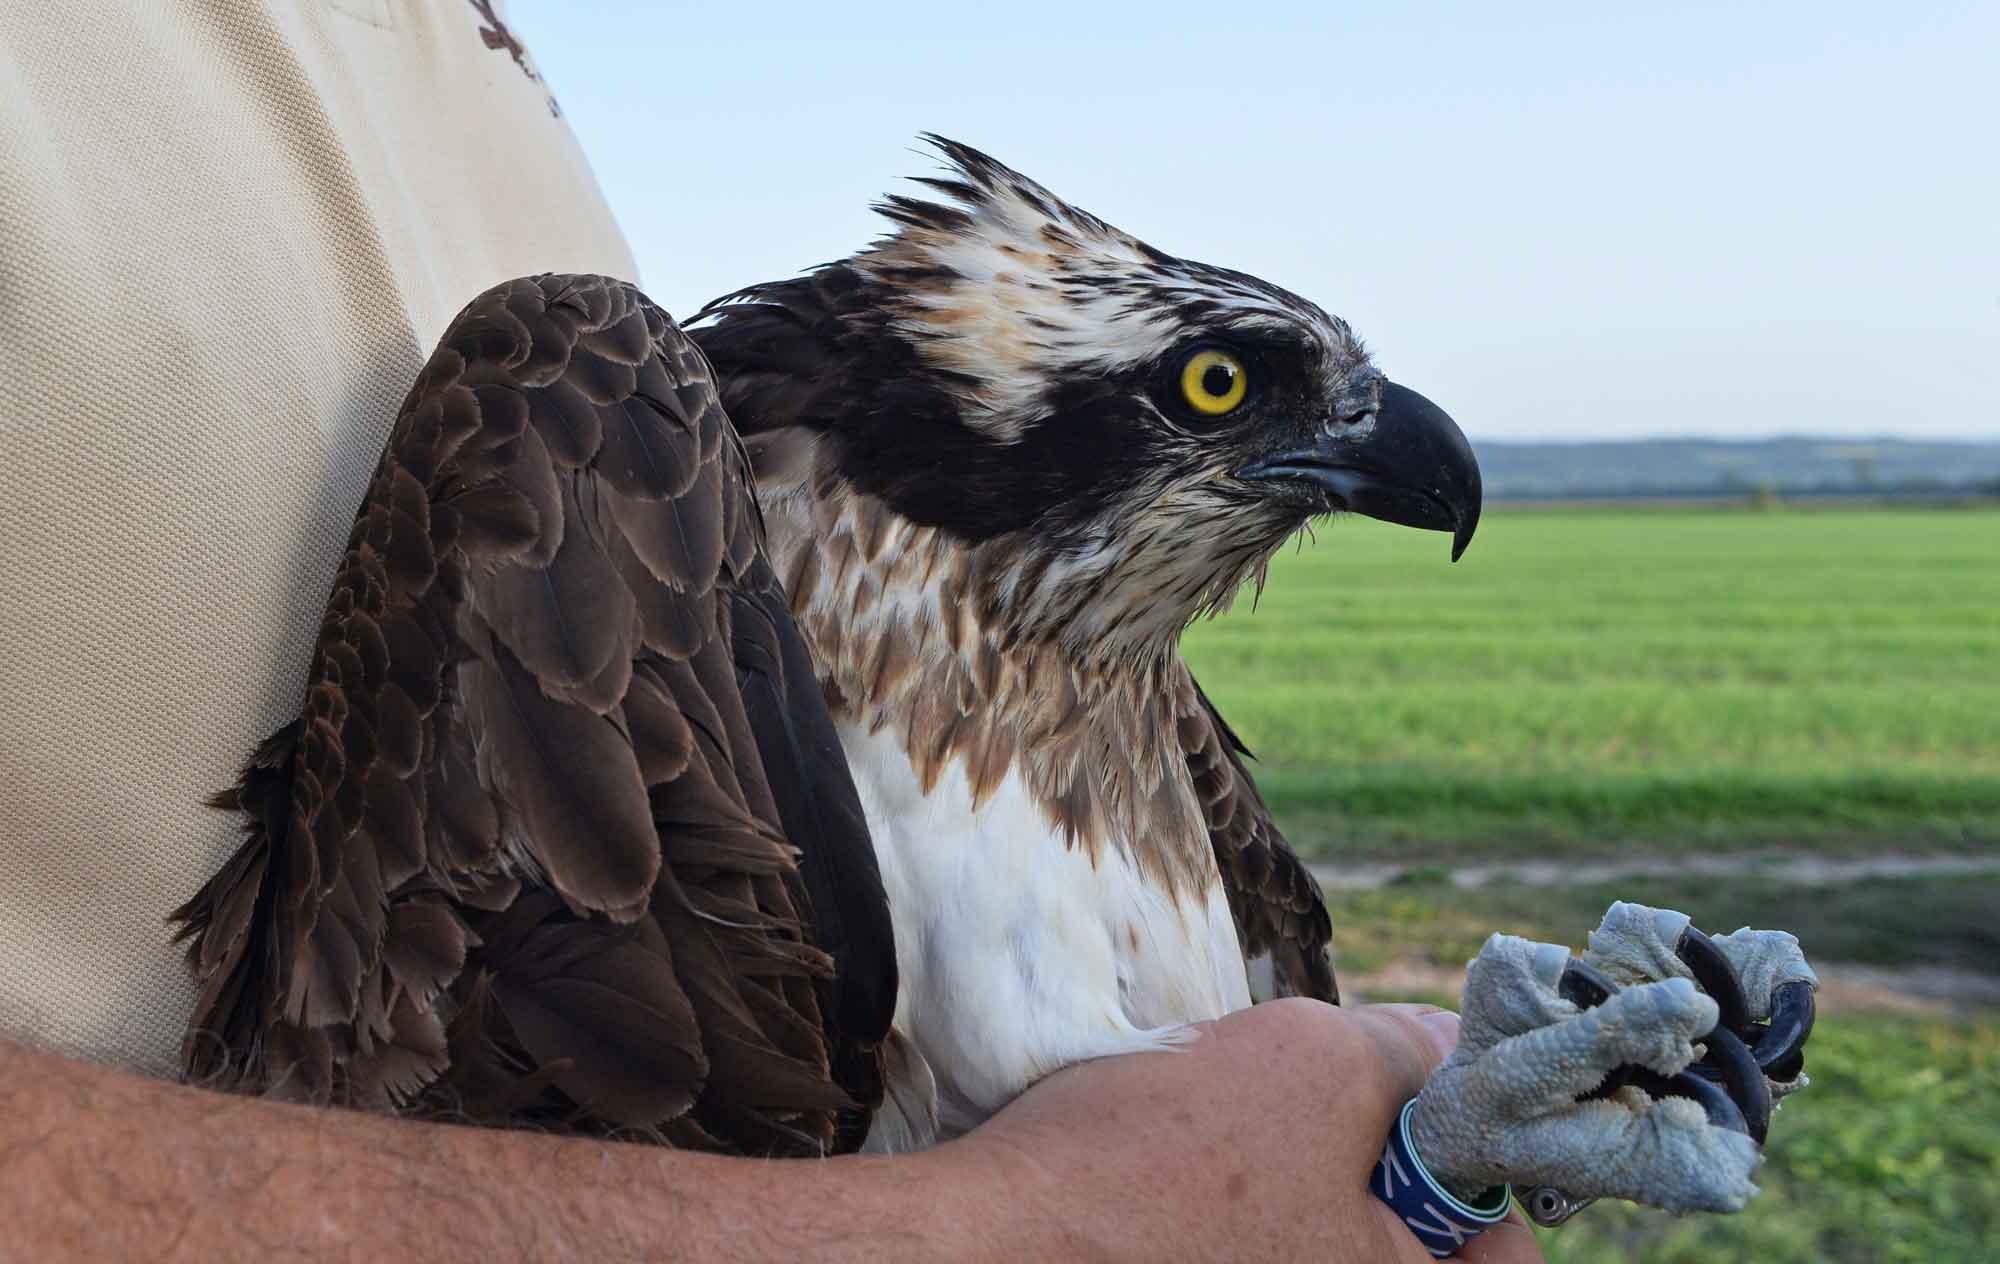 KF7 rescued adult female Osprey